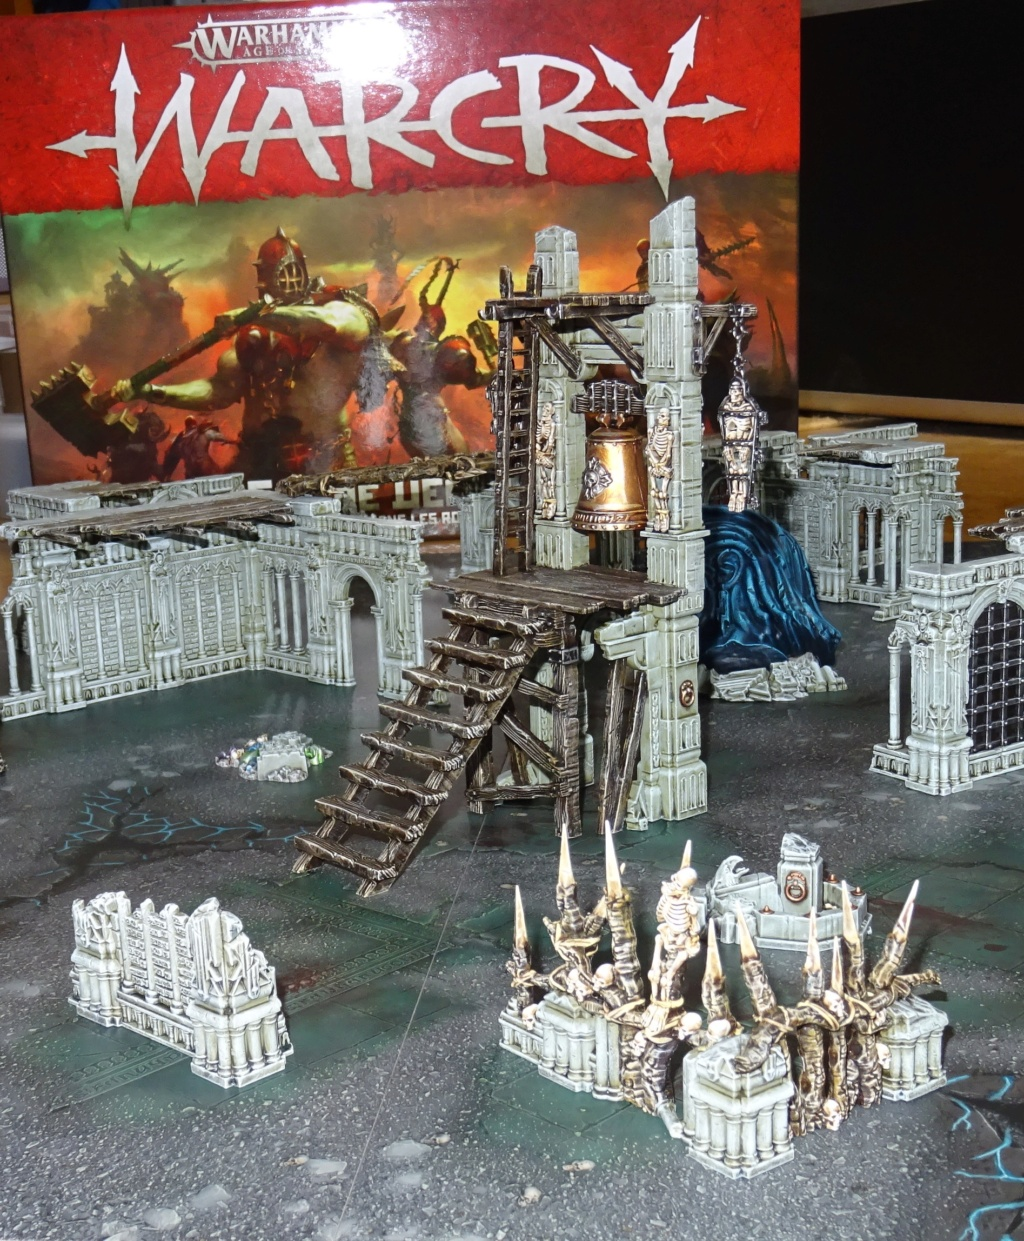 Warcry chez Warhammer/Games Workshop, la version de Razorspoon - Page 2 Ruines17